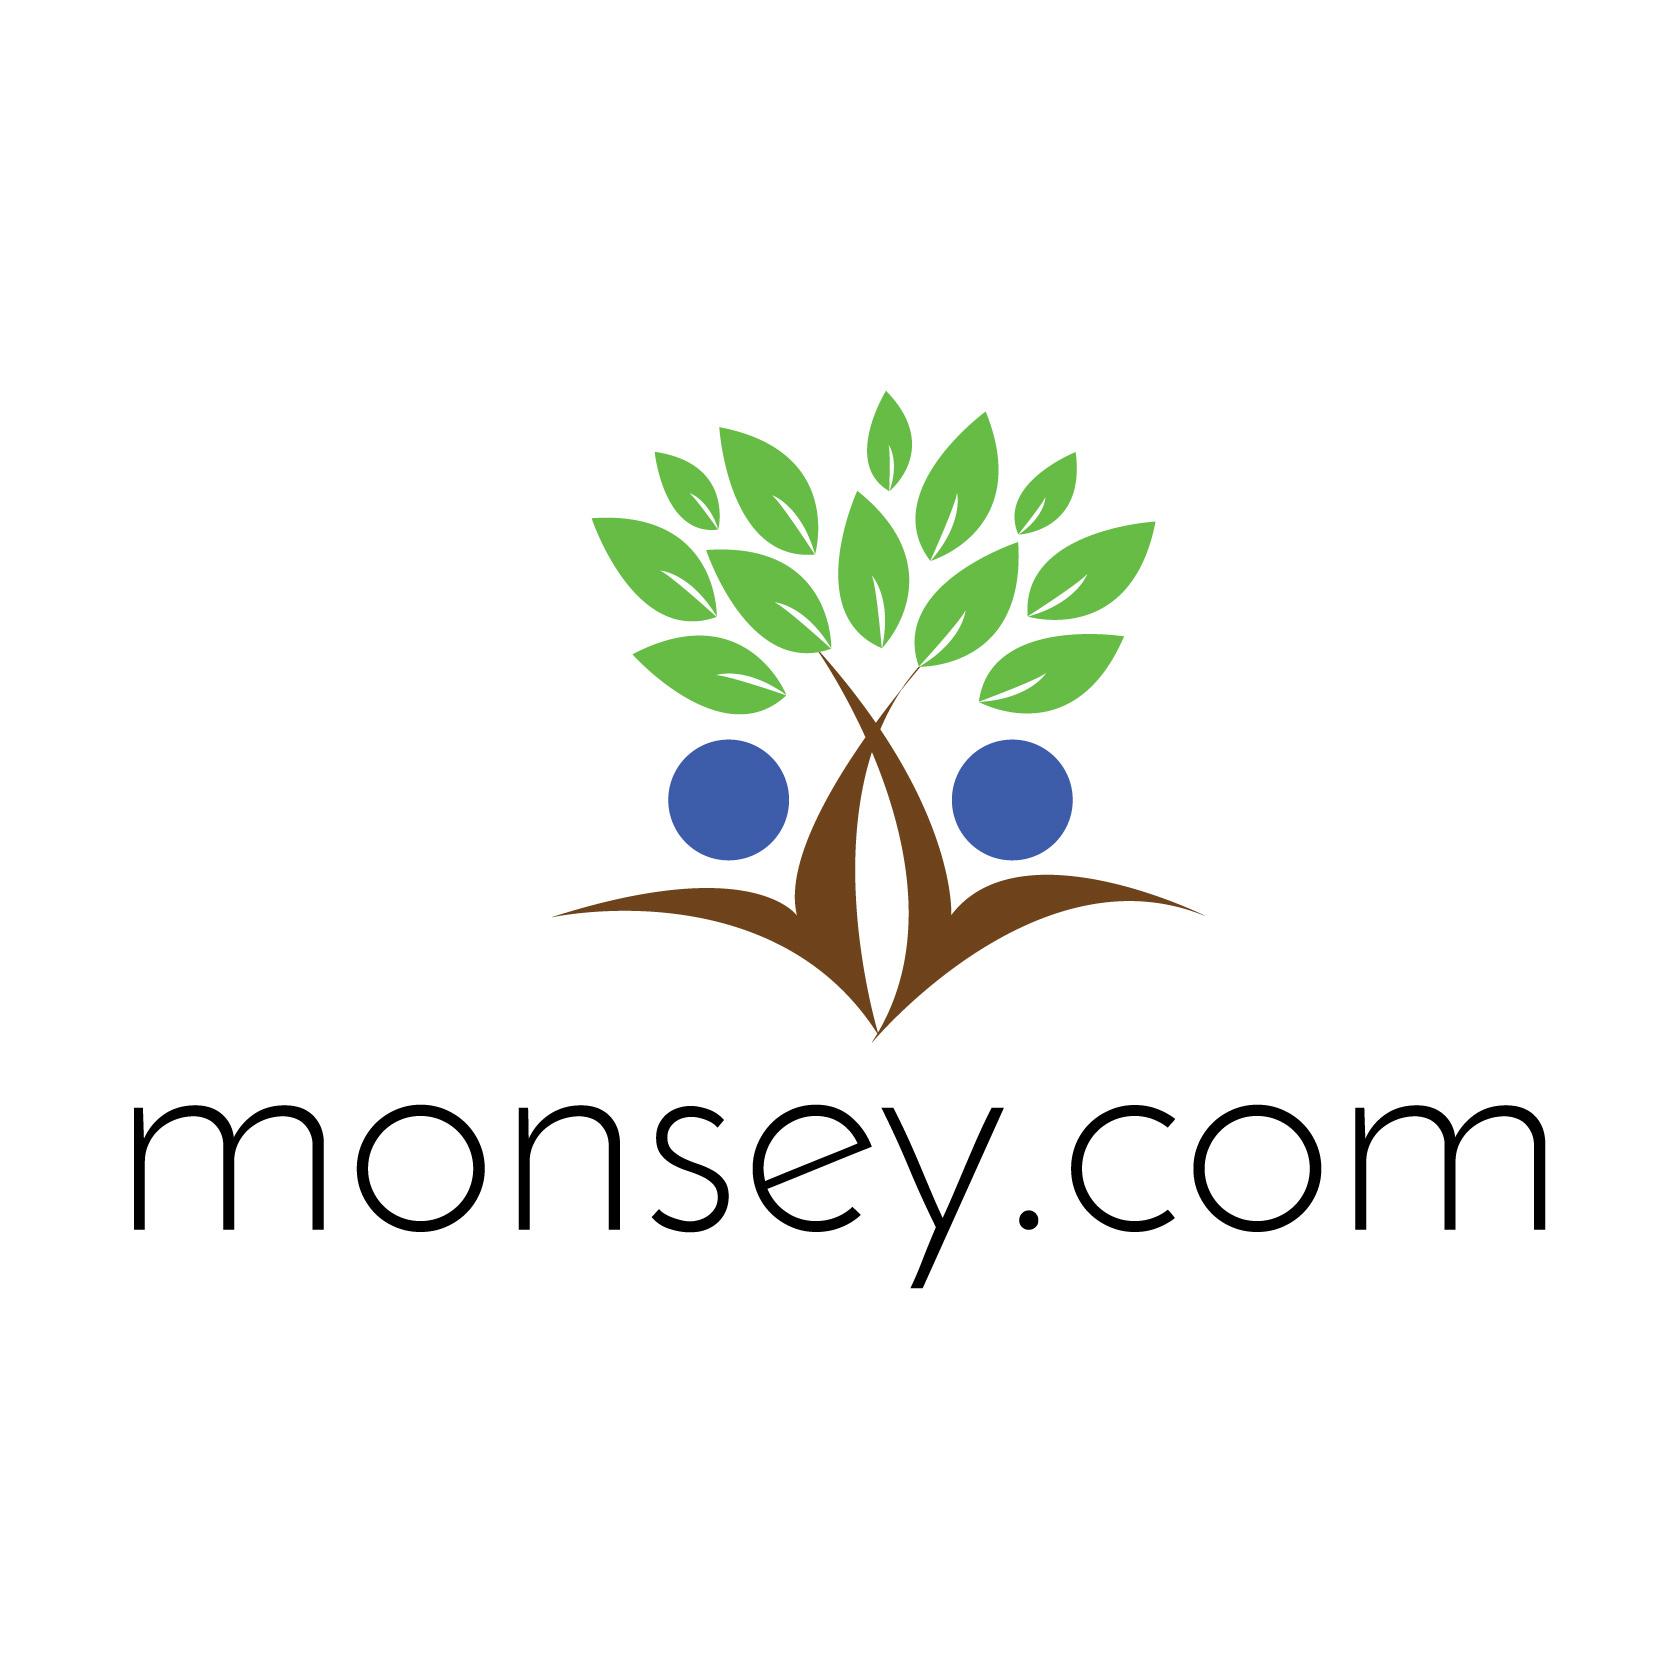 Monsey.com